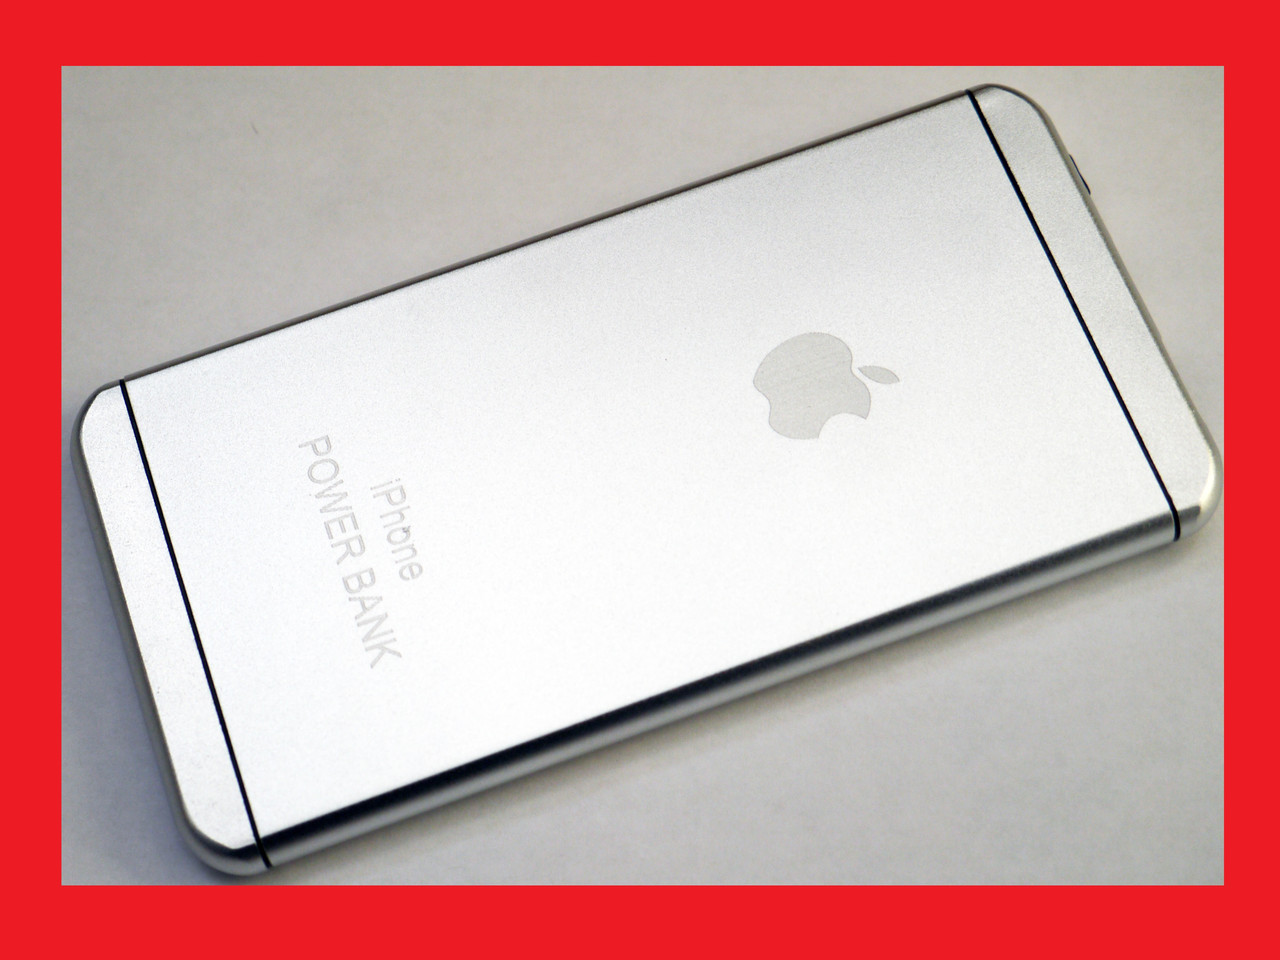 Ipower 16000 mAh Power Ban iPhone 6 style 1xUSB тонкий корпус металл